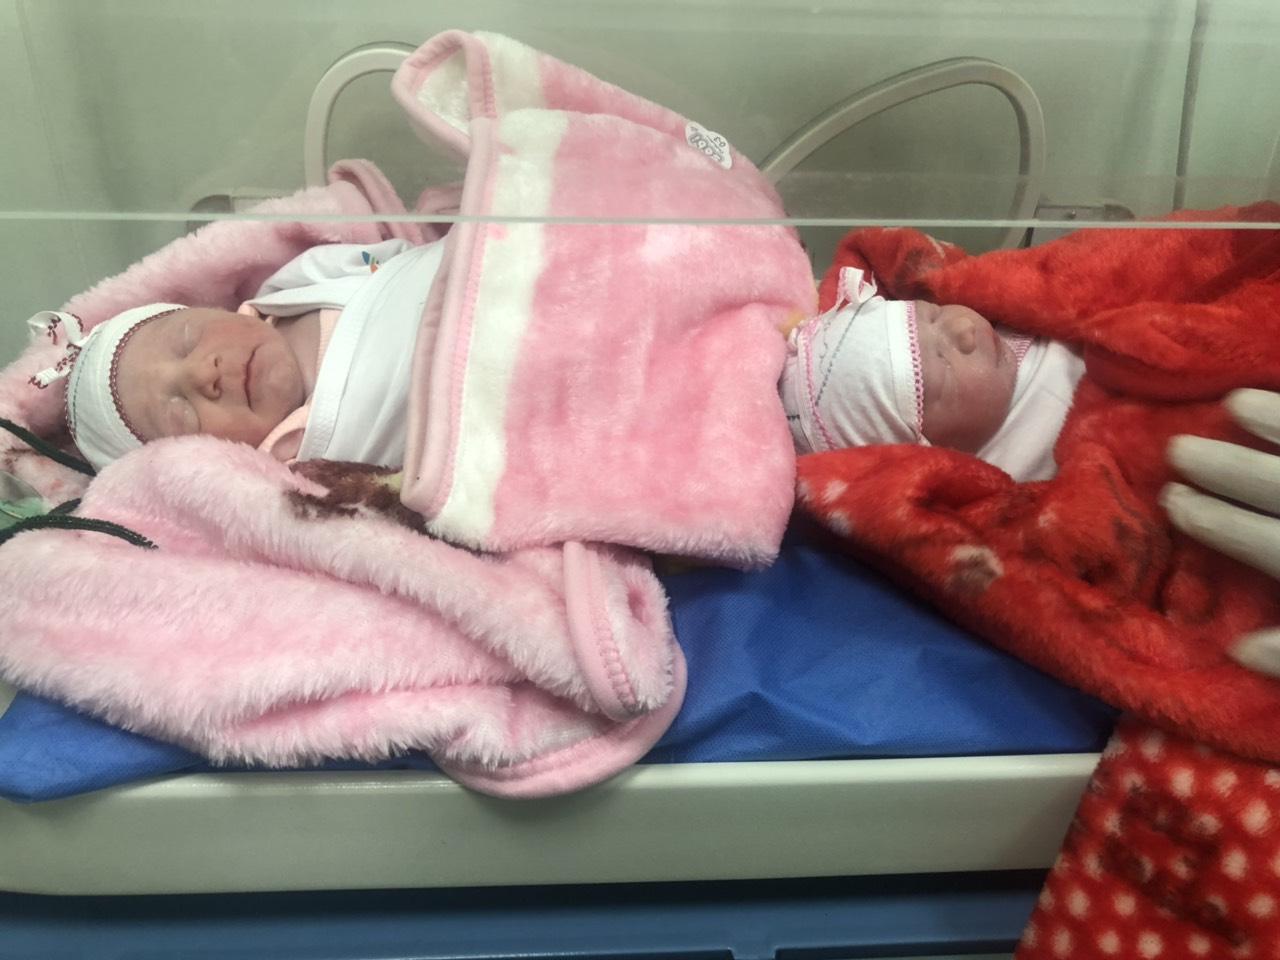 ولادة تؤام